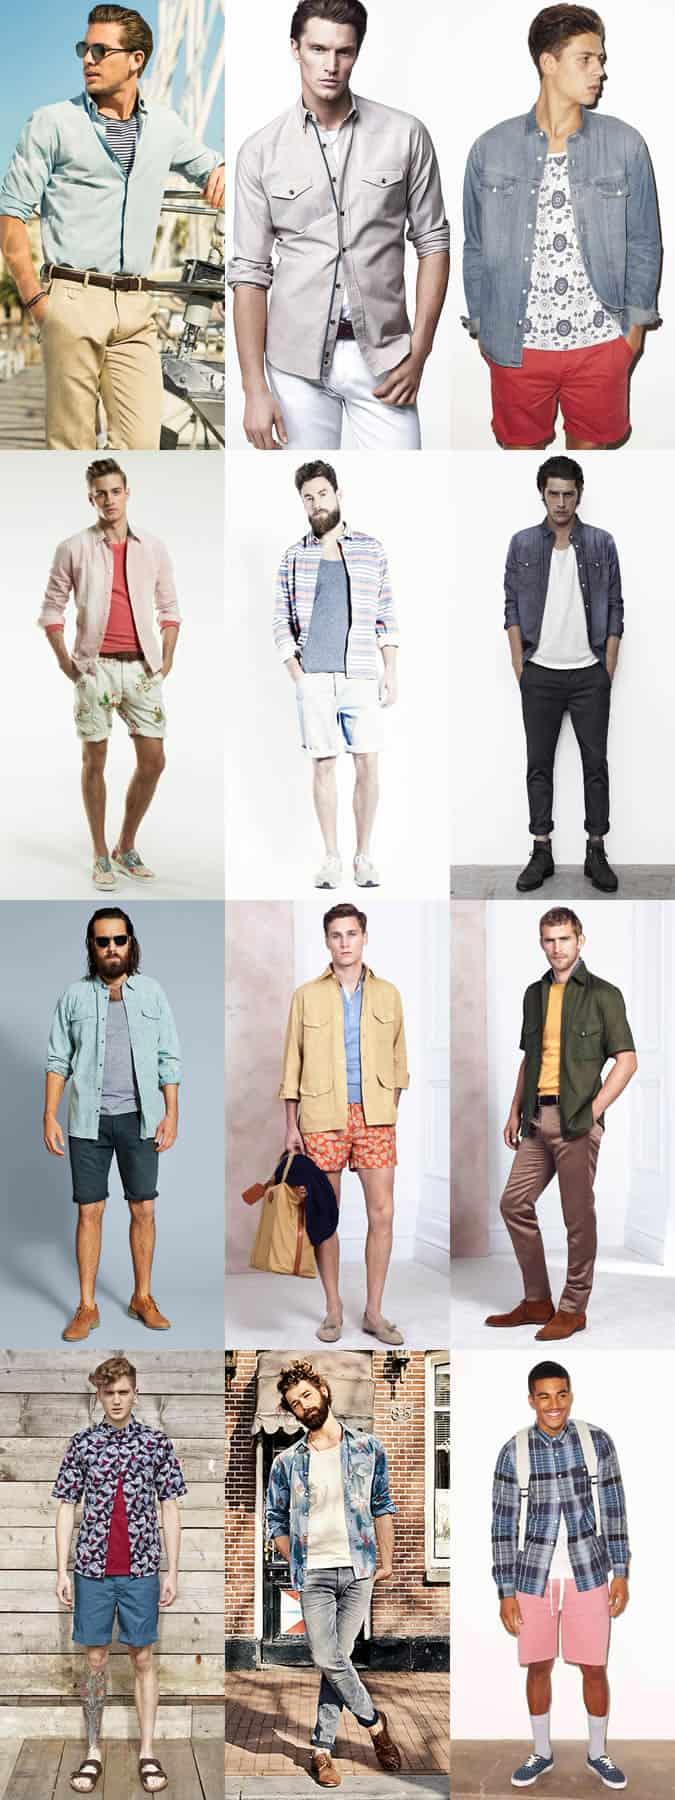 Men's Summer Shirt Layering - Outfit Inspiration Lookbook